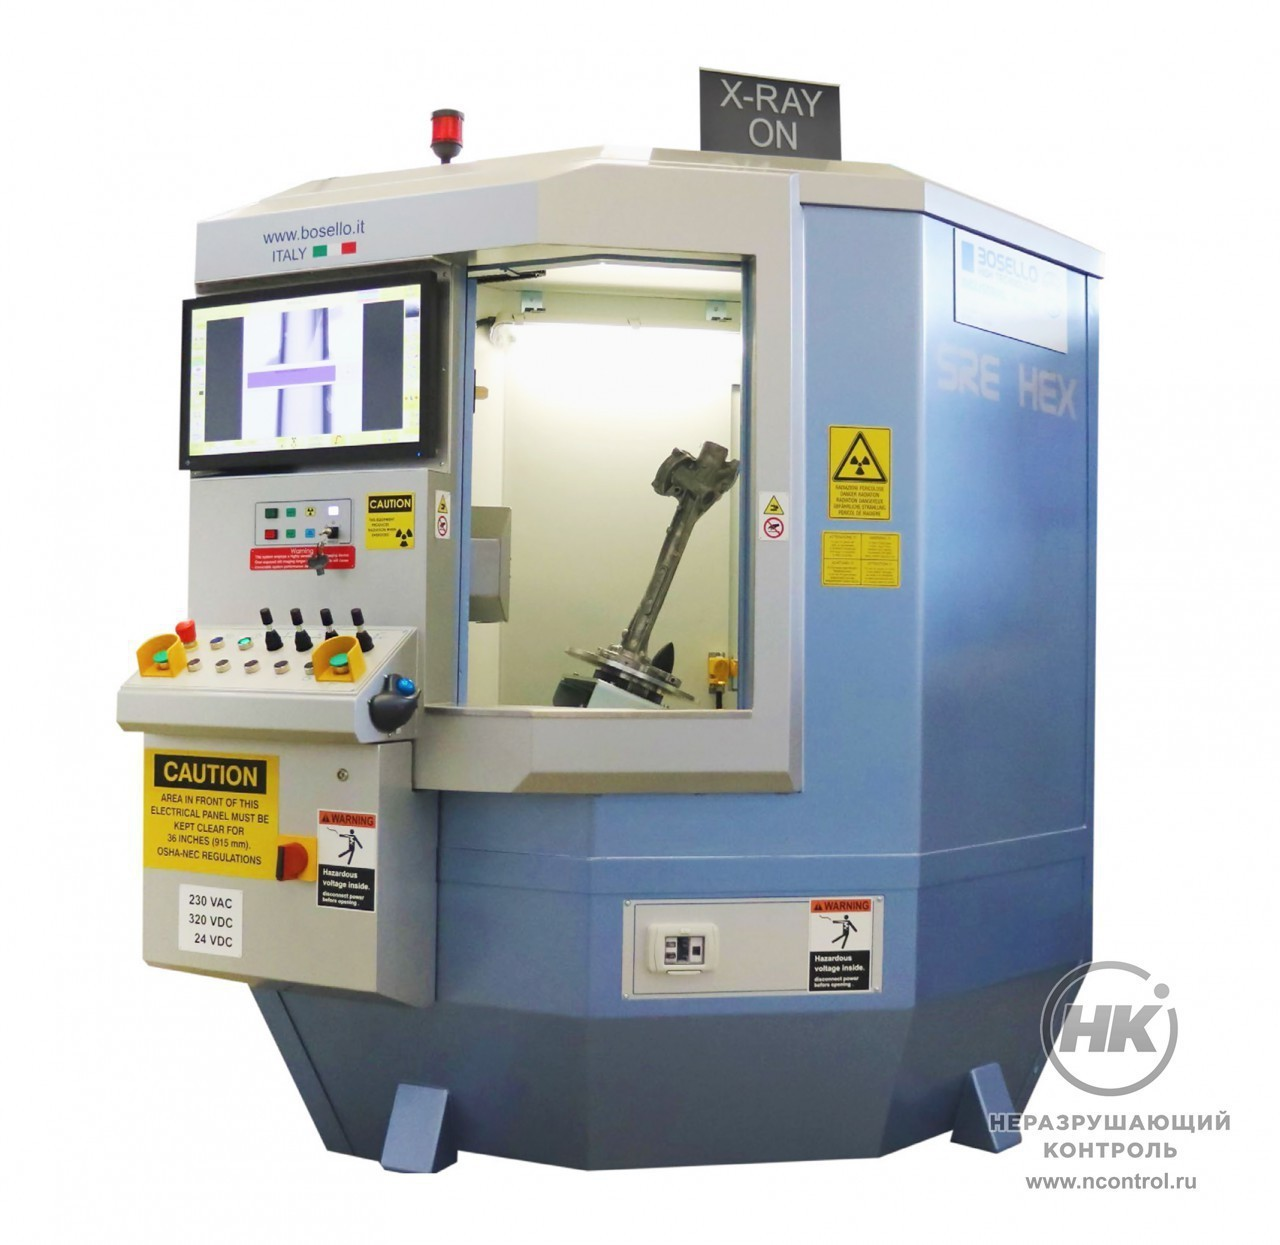 Рентгенотелевизионная установка BOSELLO SRE HEX